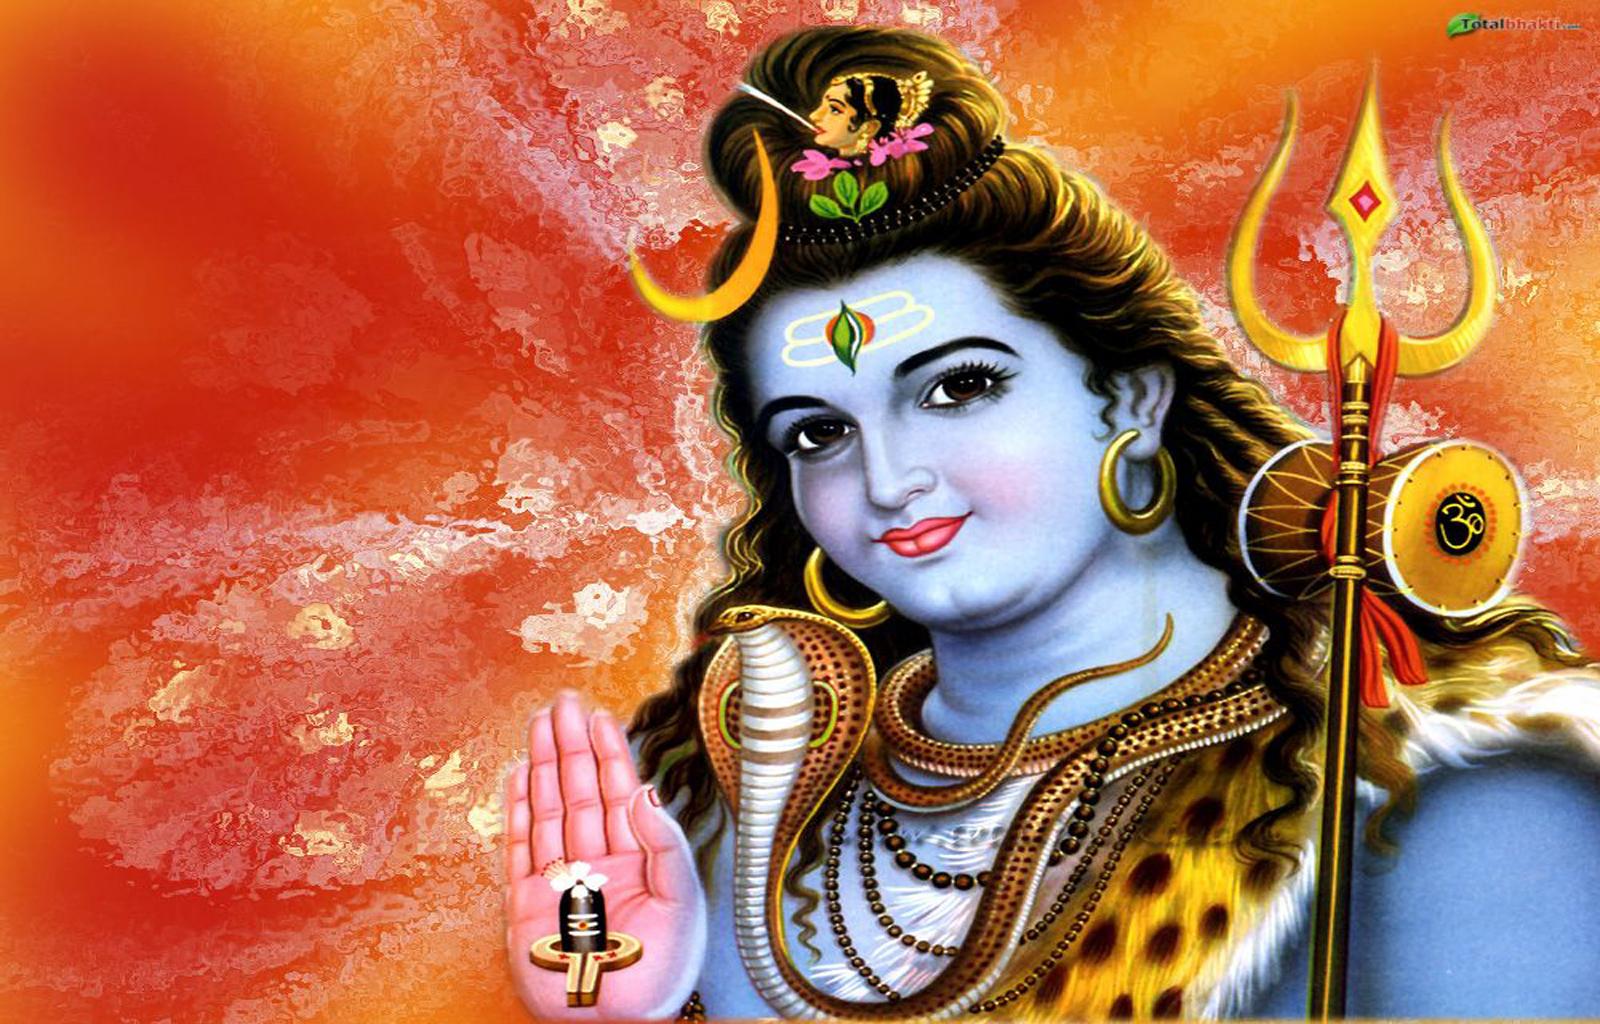 http://4.bp.blogspot.com/-OFPB5QiIEXI/T5L0MMefNSI/AAAAAAAAYvE/DUbt0cd-fNg/s1600/Lord-Shiva-70.jpg